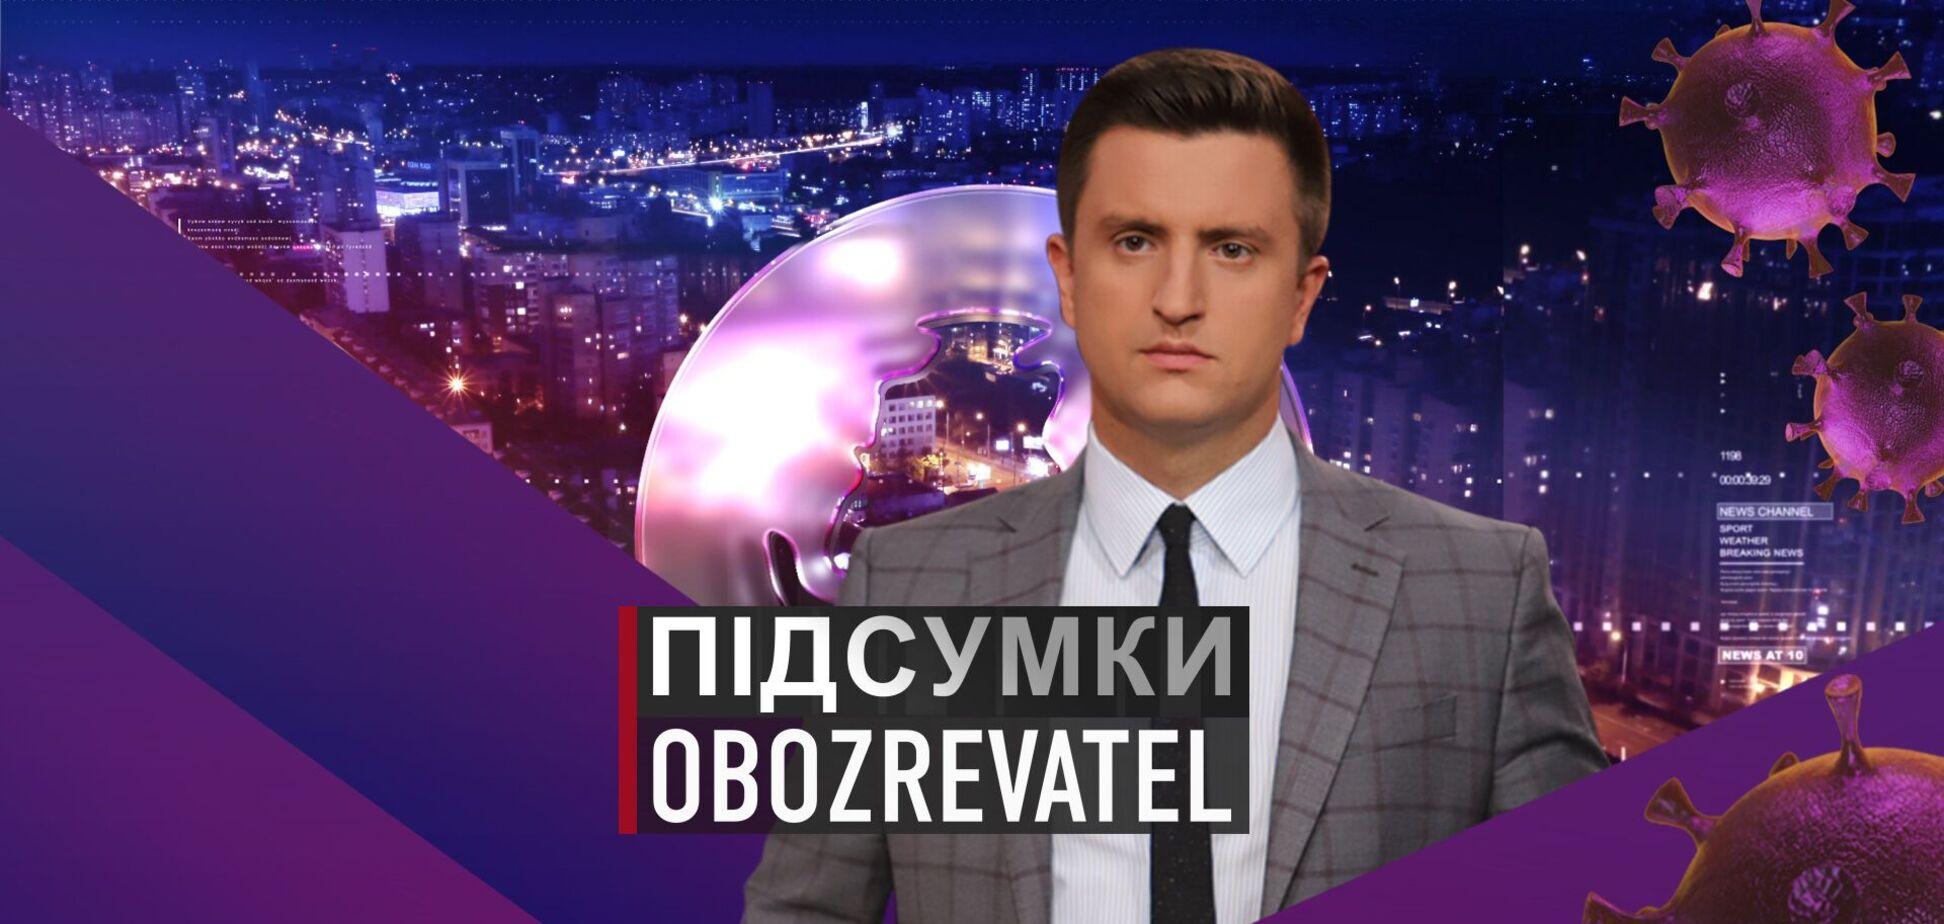 Підсумки с Вадимом Колодийчуком. Среда, 24 марта